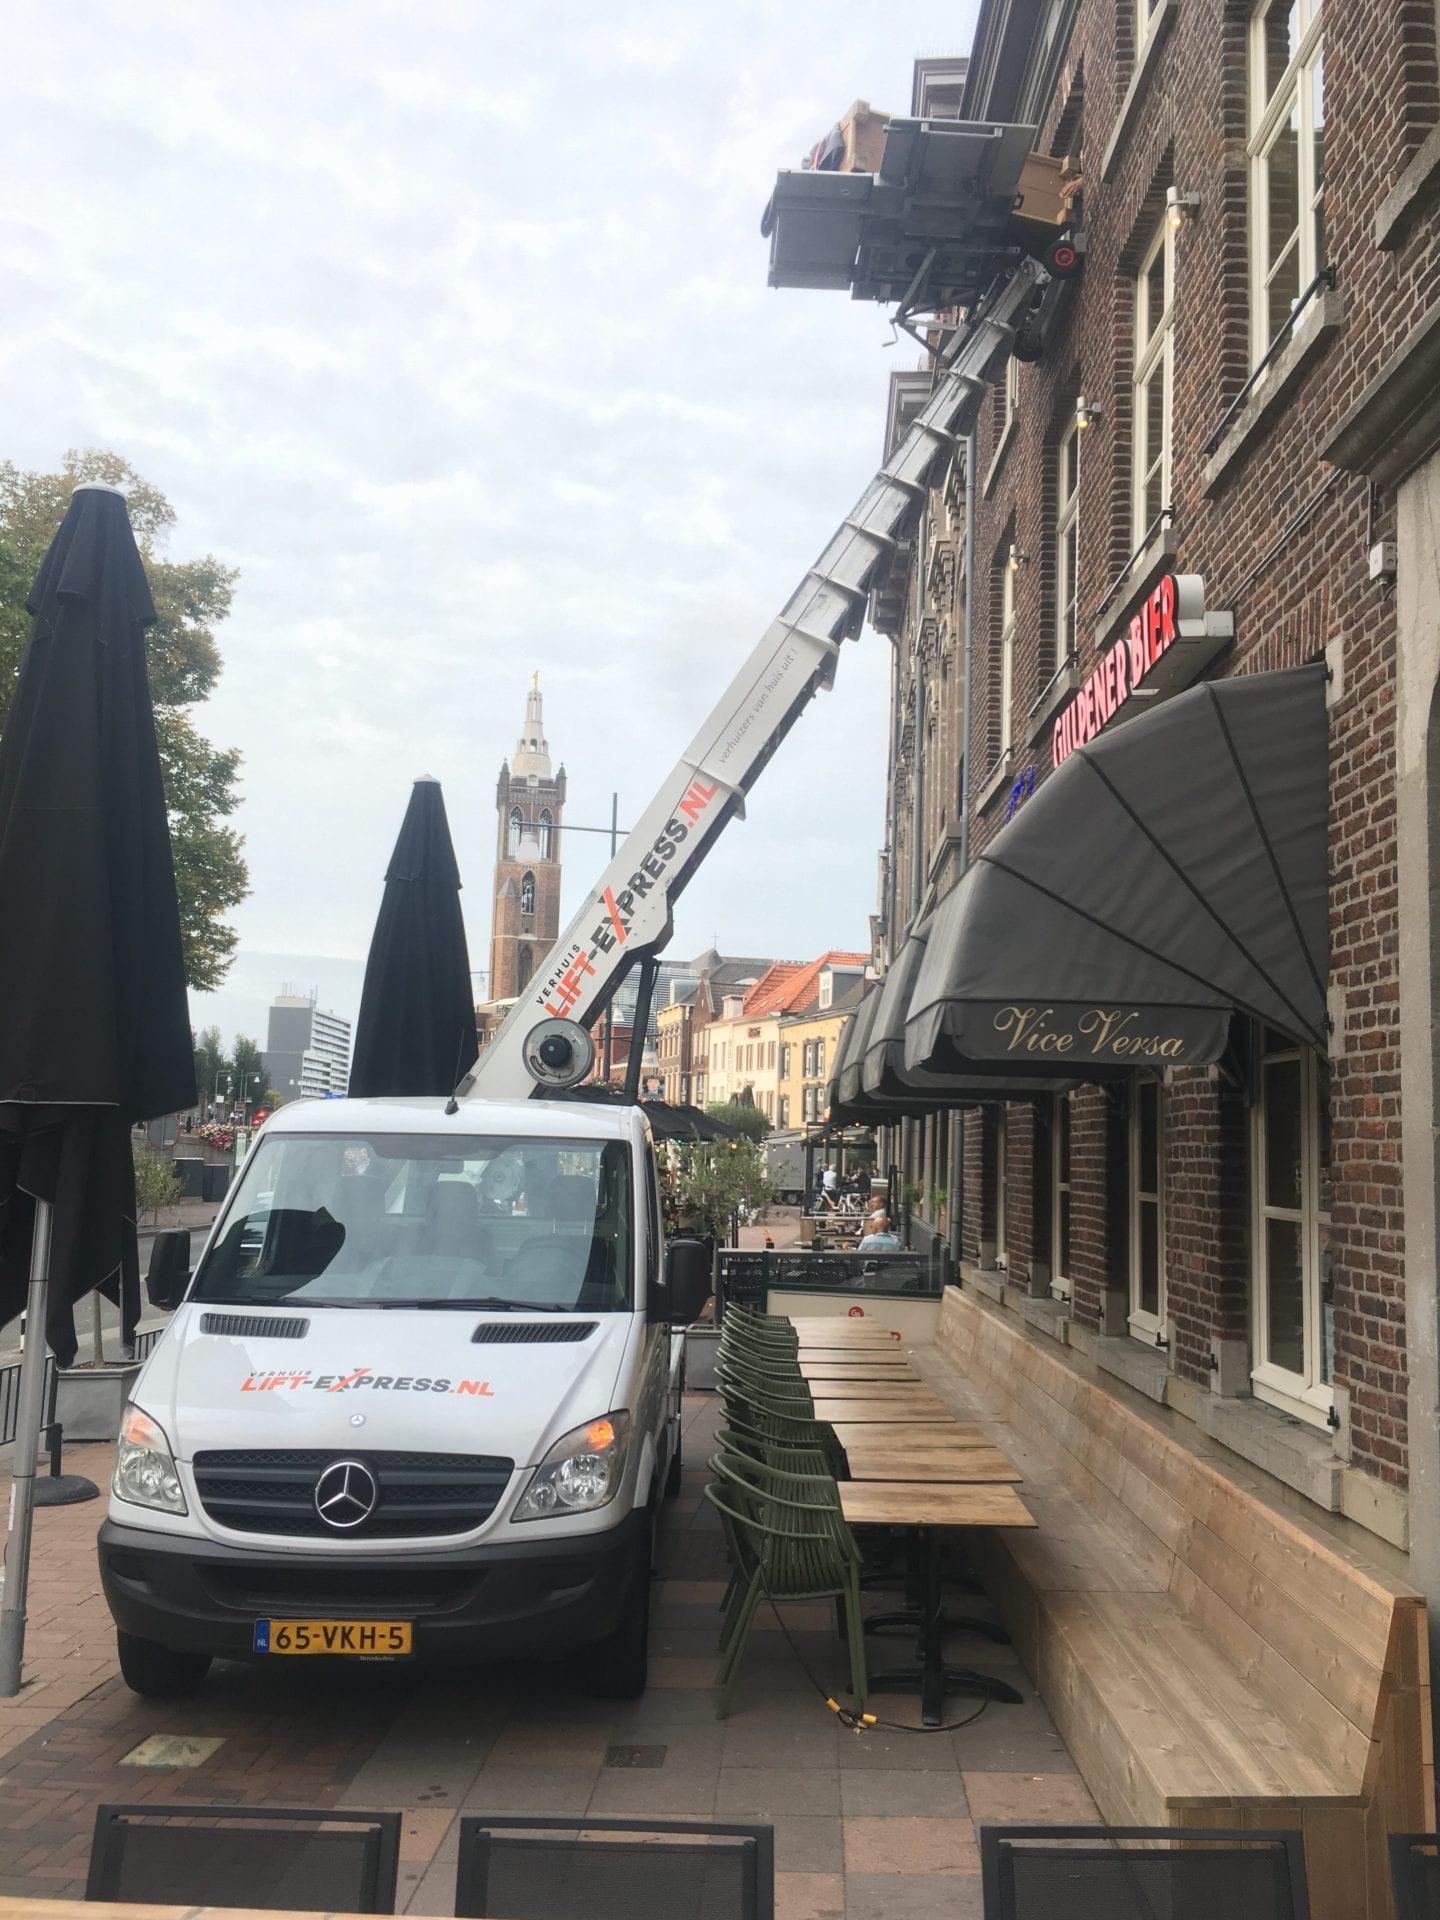 Verhuislift Roermond Roersingel